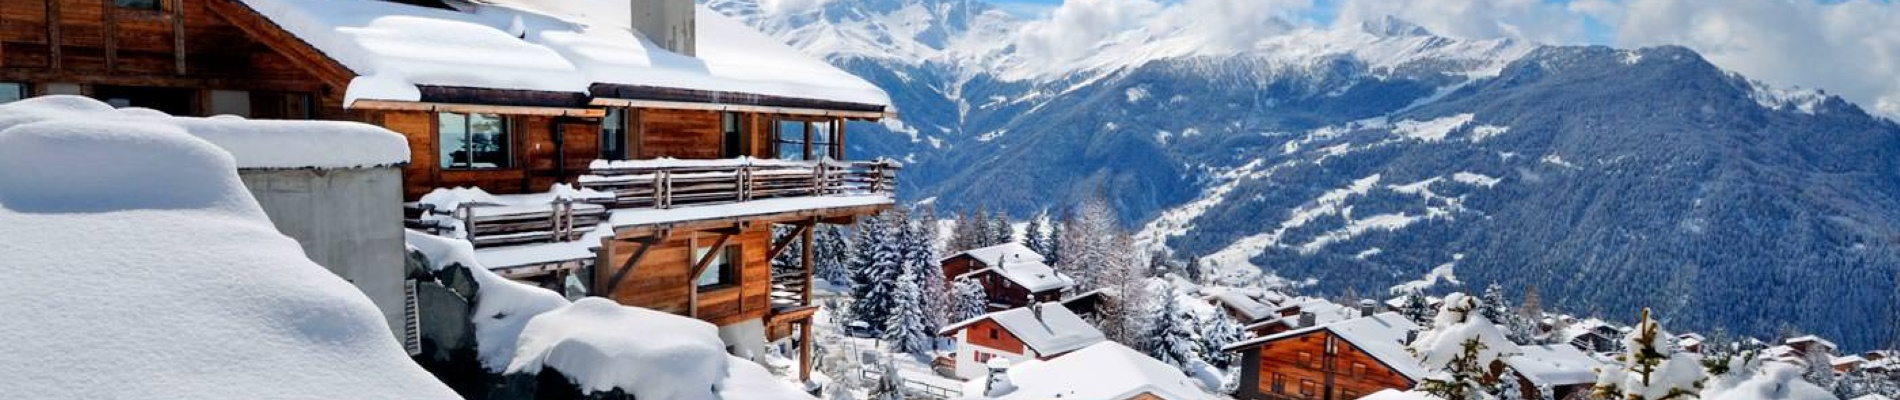 verbier skiing case study